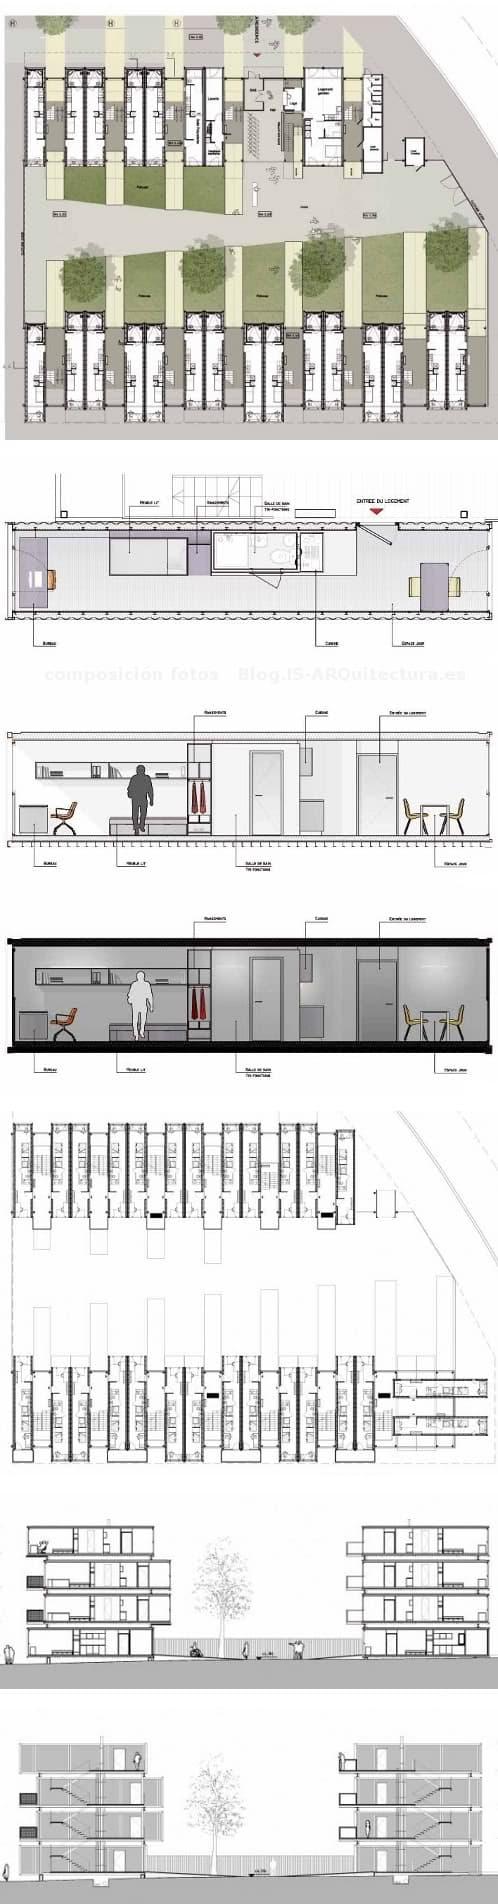 planos-residencia-contendores-a_docks